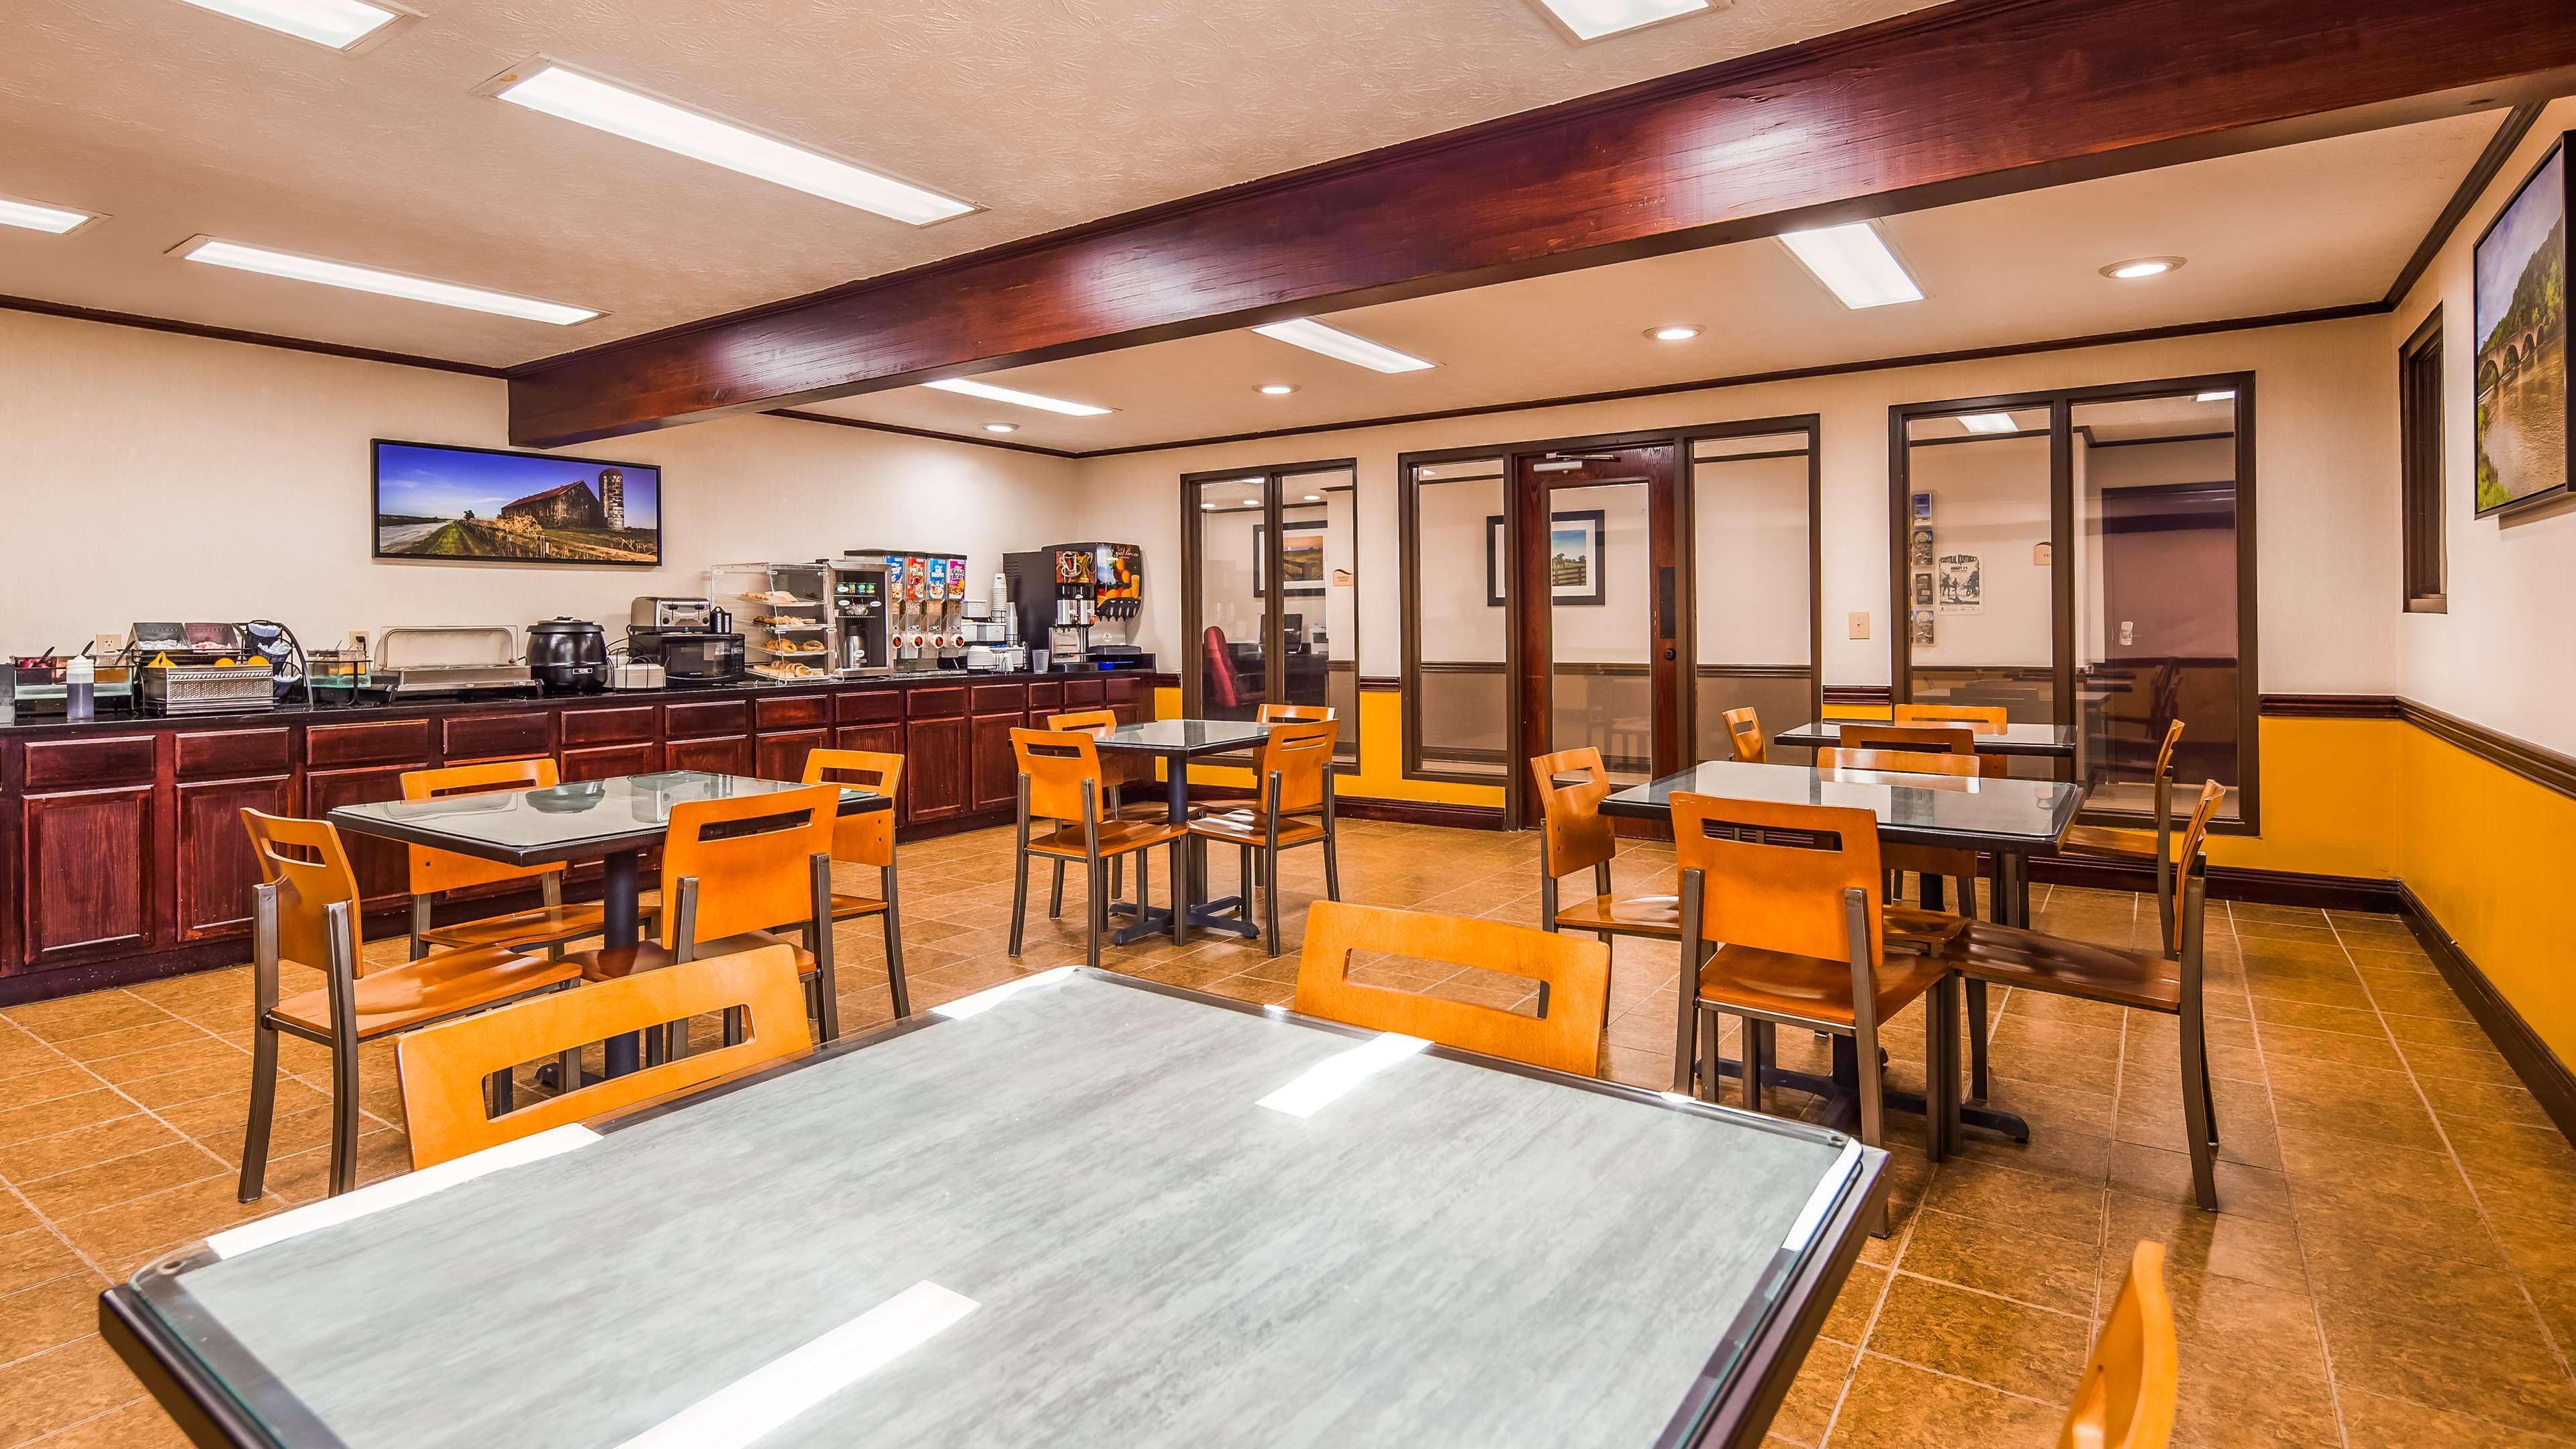 Best Western Campbellsville Inn image 1